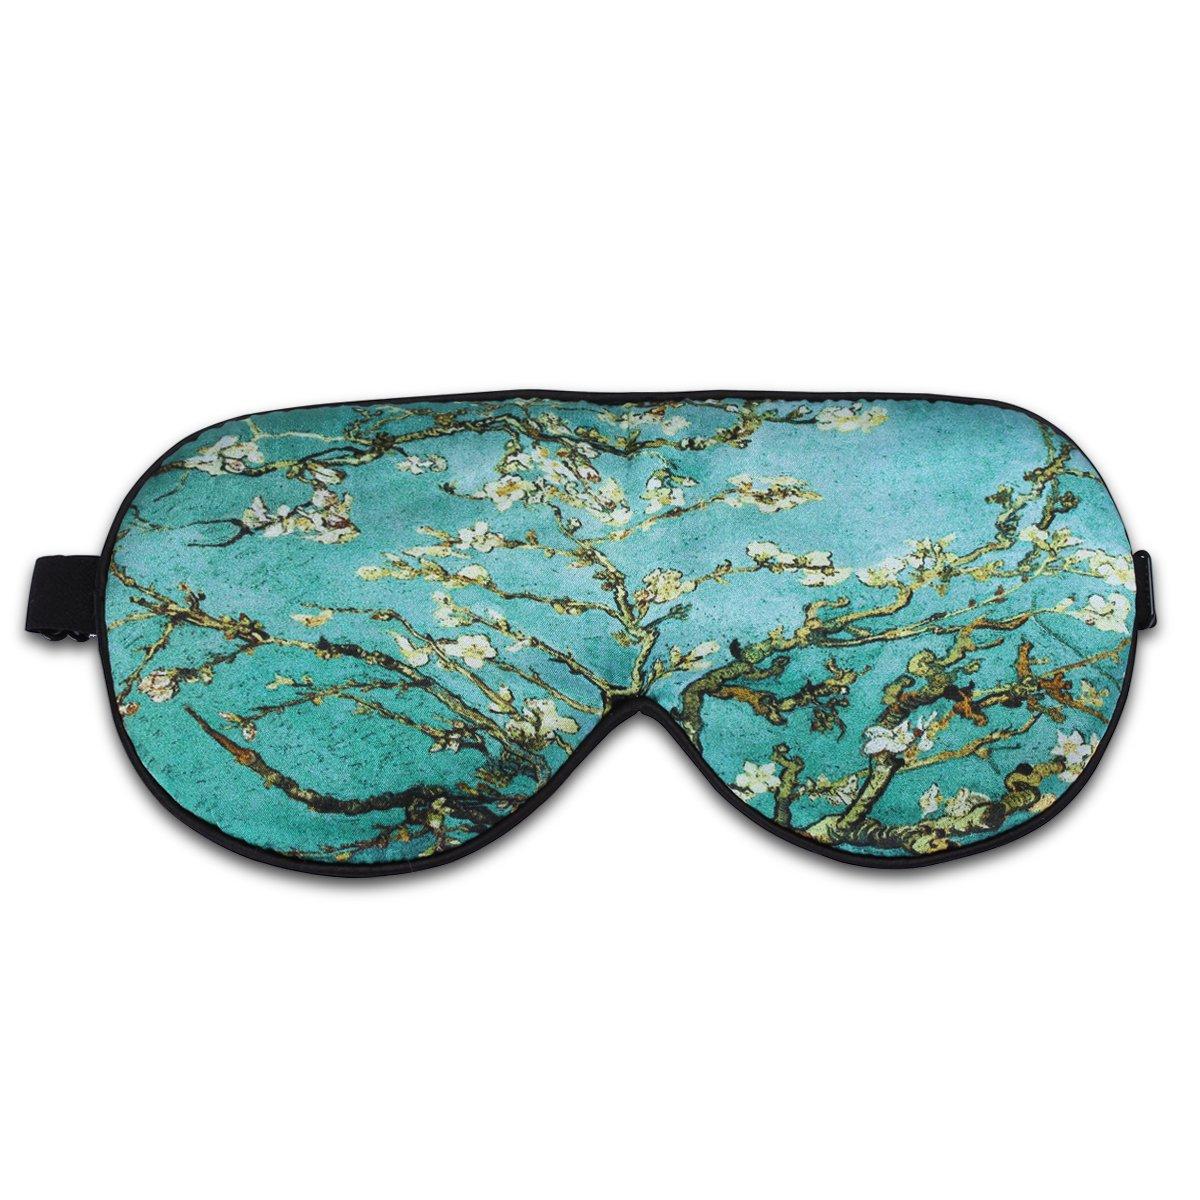 ALASKA BEAR® Natural silk sleep mask & blindfold, super-smooth eye mask (Almond Blossom)